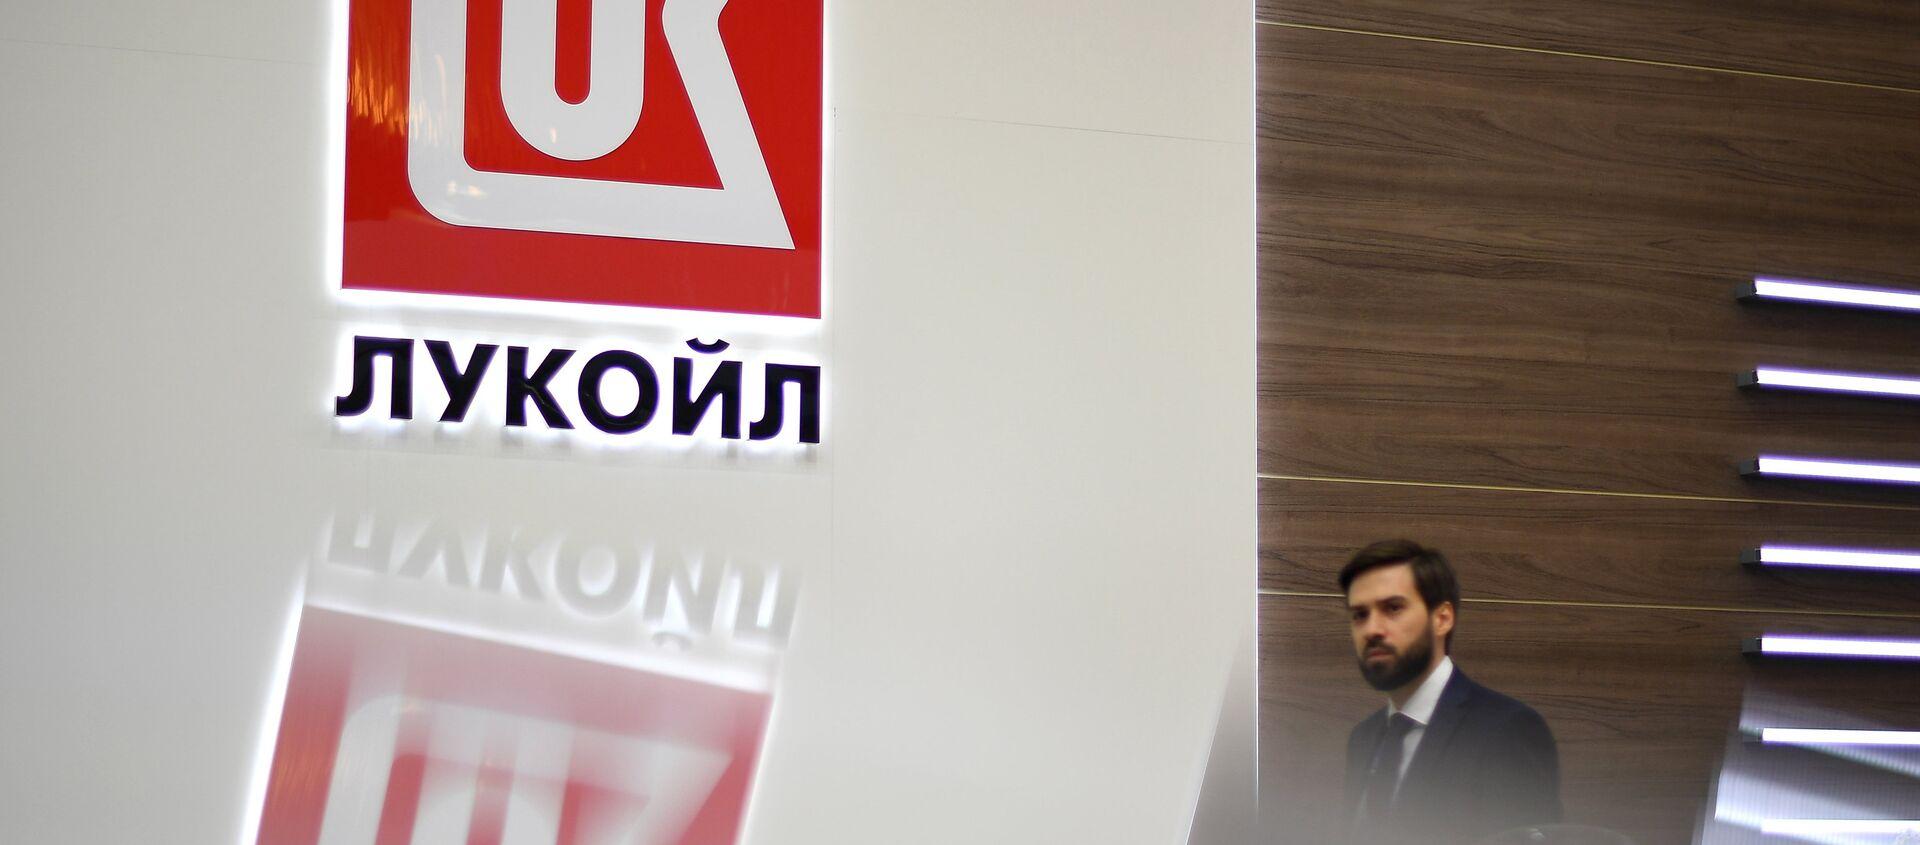 Logo de la petrolera rusa Lukoil - Sputnik Mundo, 1920, 19.02.2020